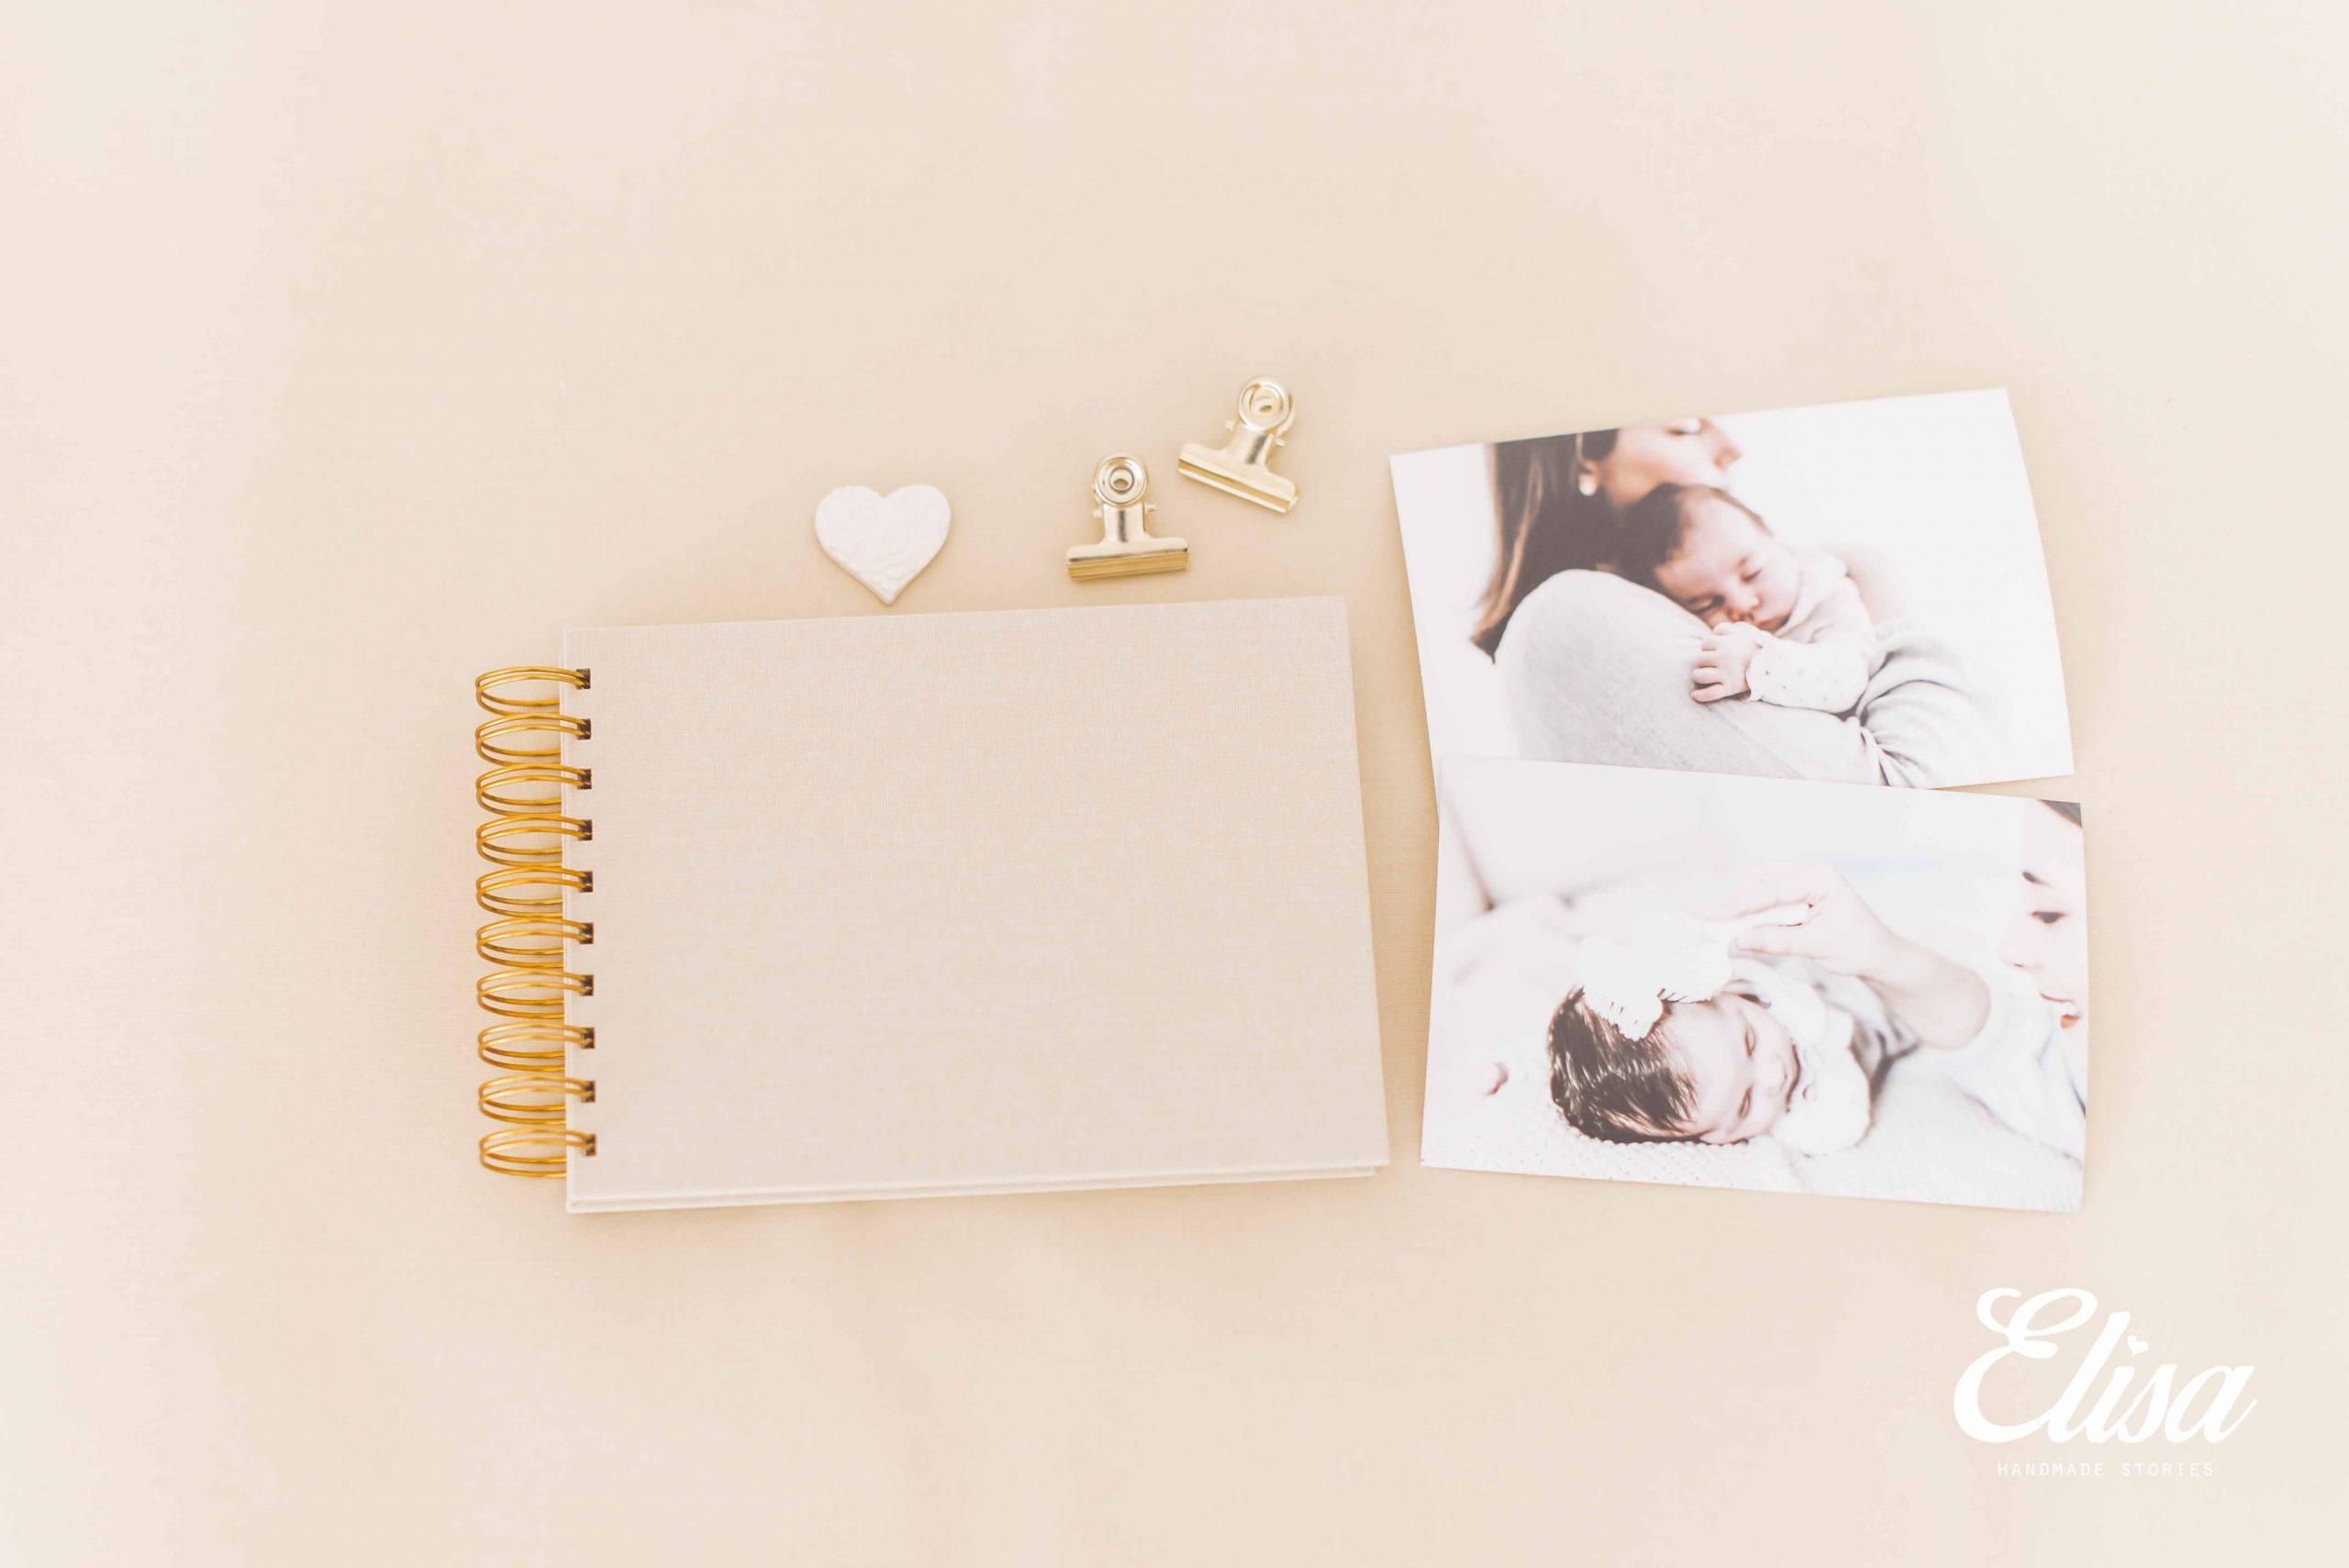 Álbum de fotos – Mini – 1 ano #01